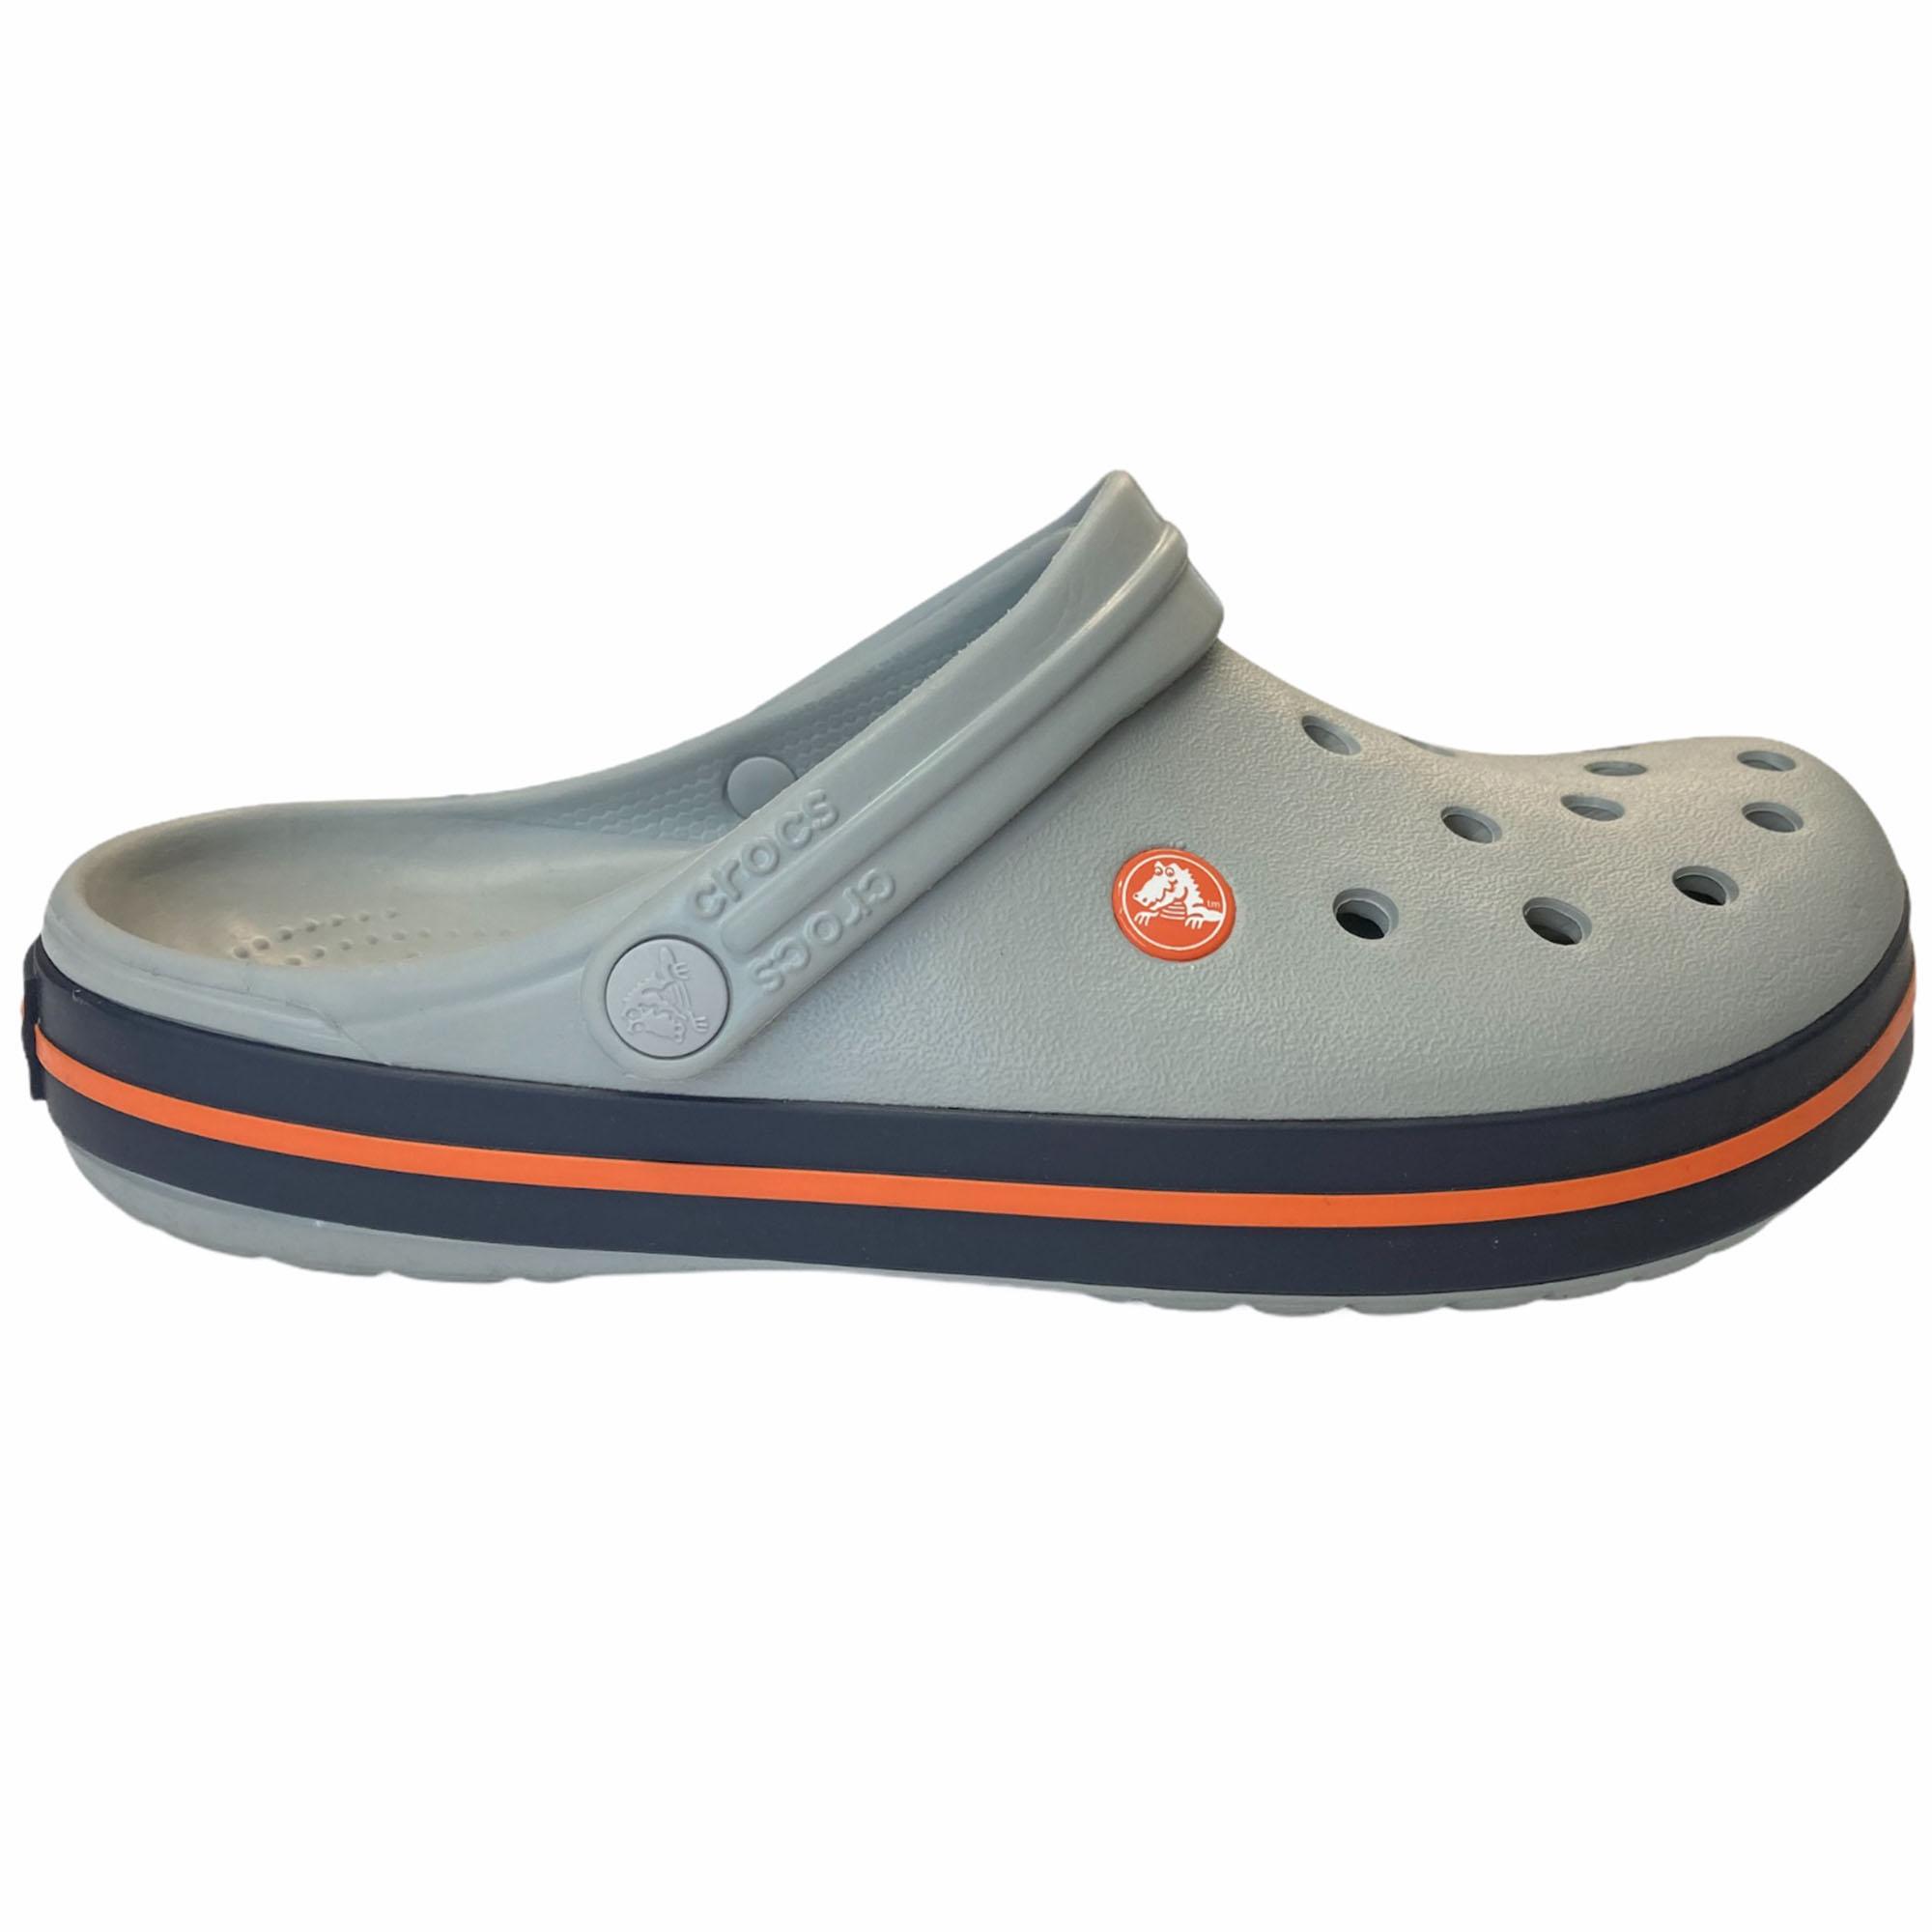 Sandália Crocs Crocband Adulto Light Grey - Cinza Claro